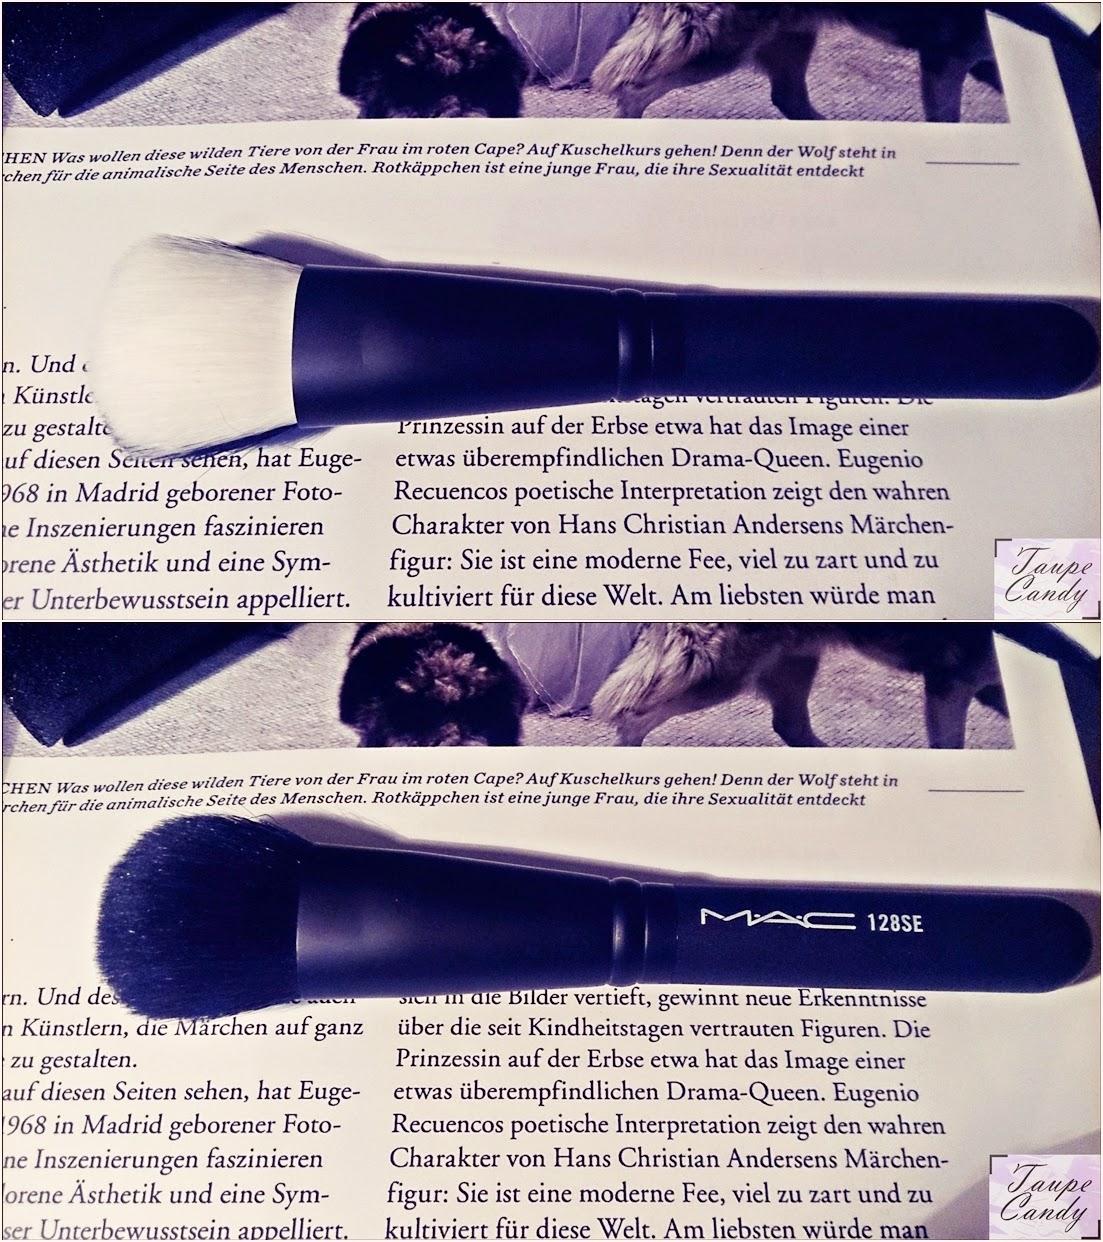 MAC In extra dimension brush kit